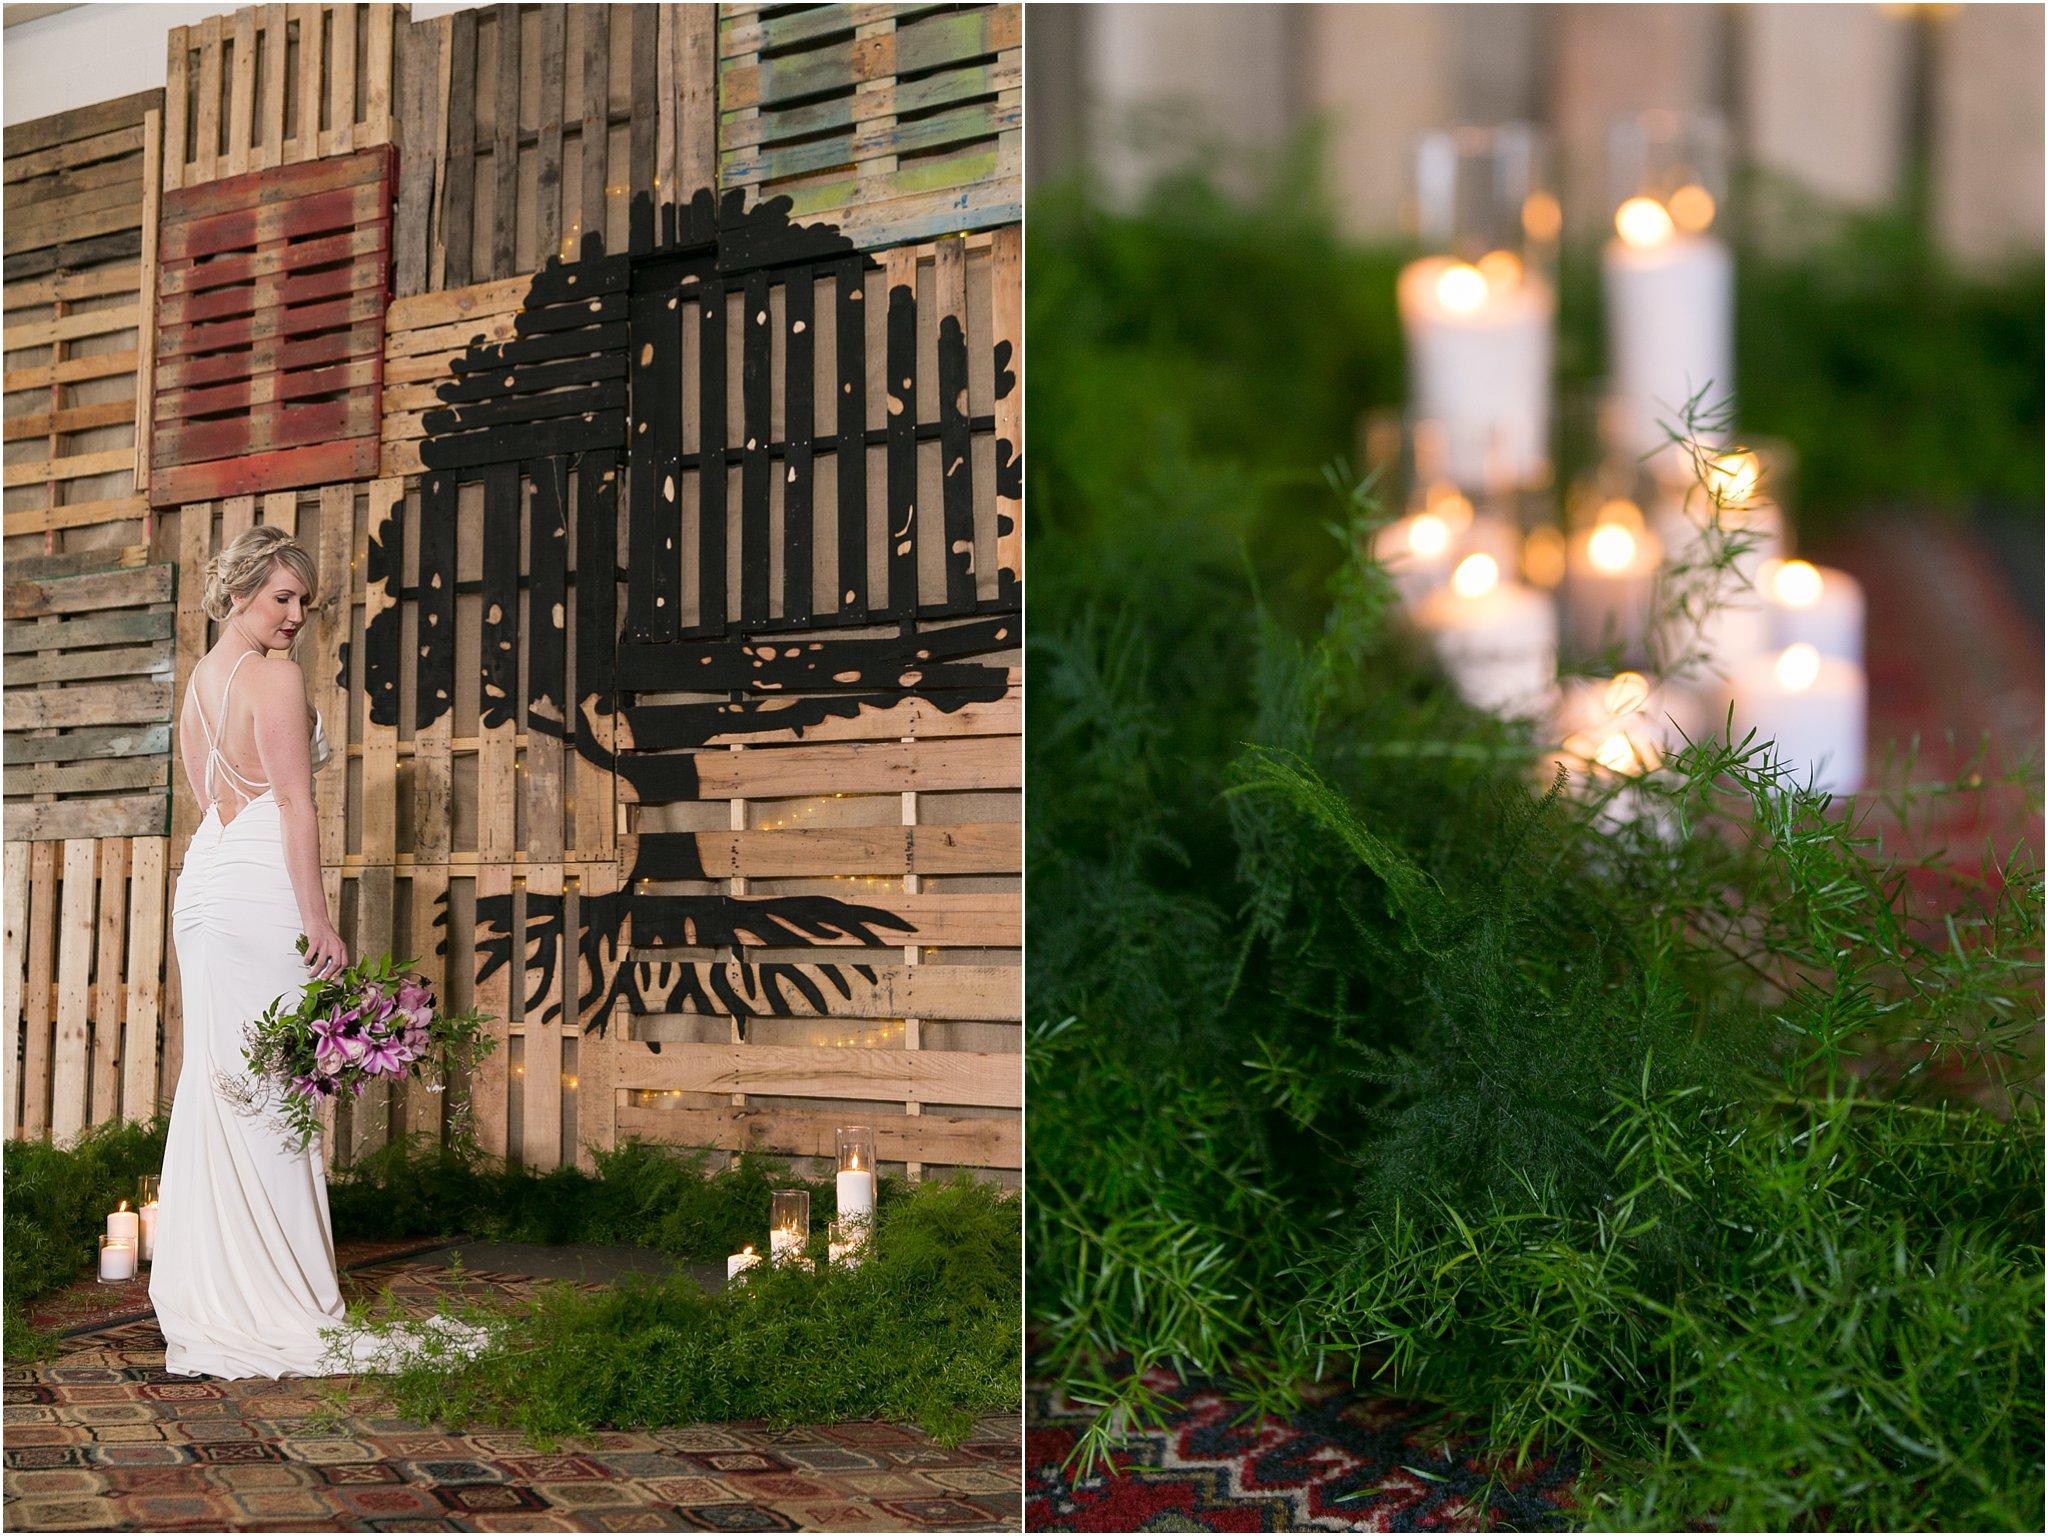 jessica_ryan_photography_oconnor_brewing_wedding_oconnor_brewing_co_norfolk_virginia_roost_flowers_blue_birds_garage__0790